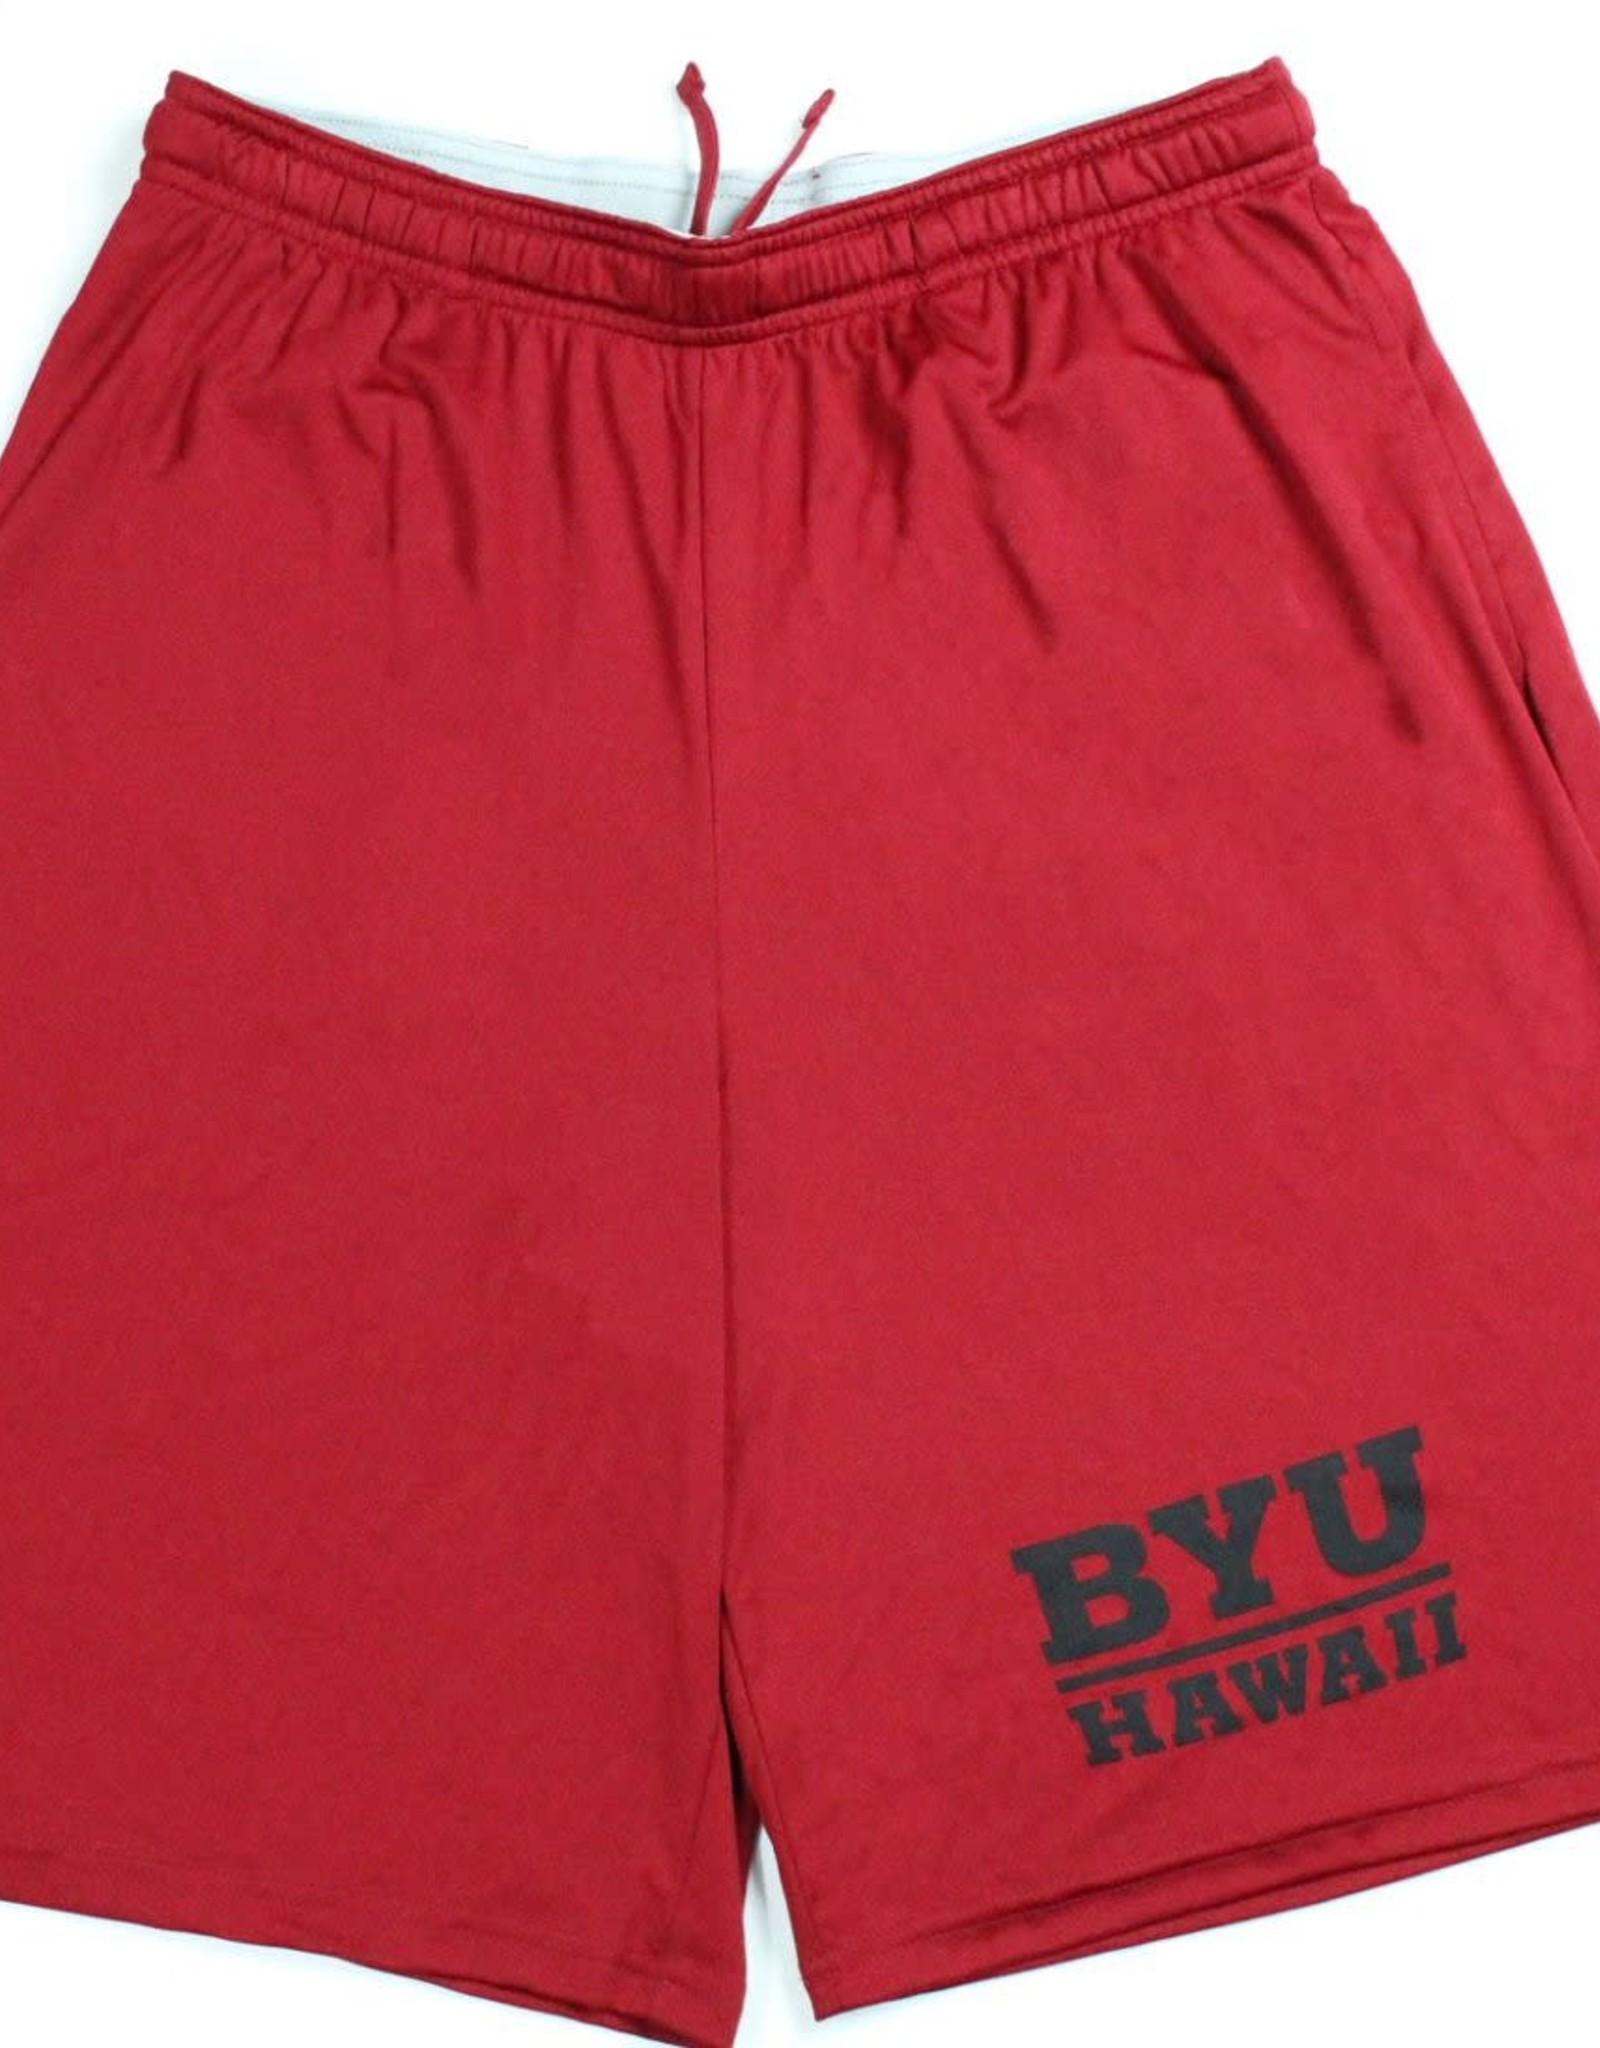 Clearance - BYU-Hawaii Essential Shorts